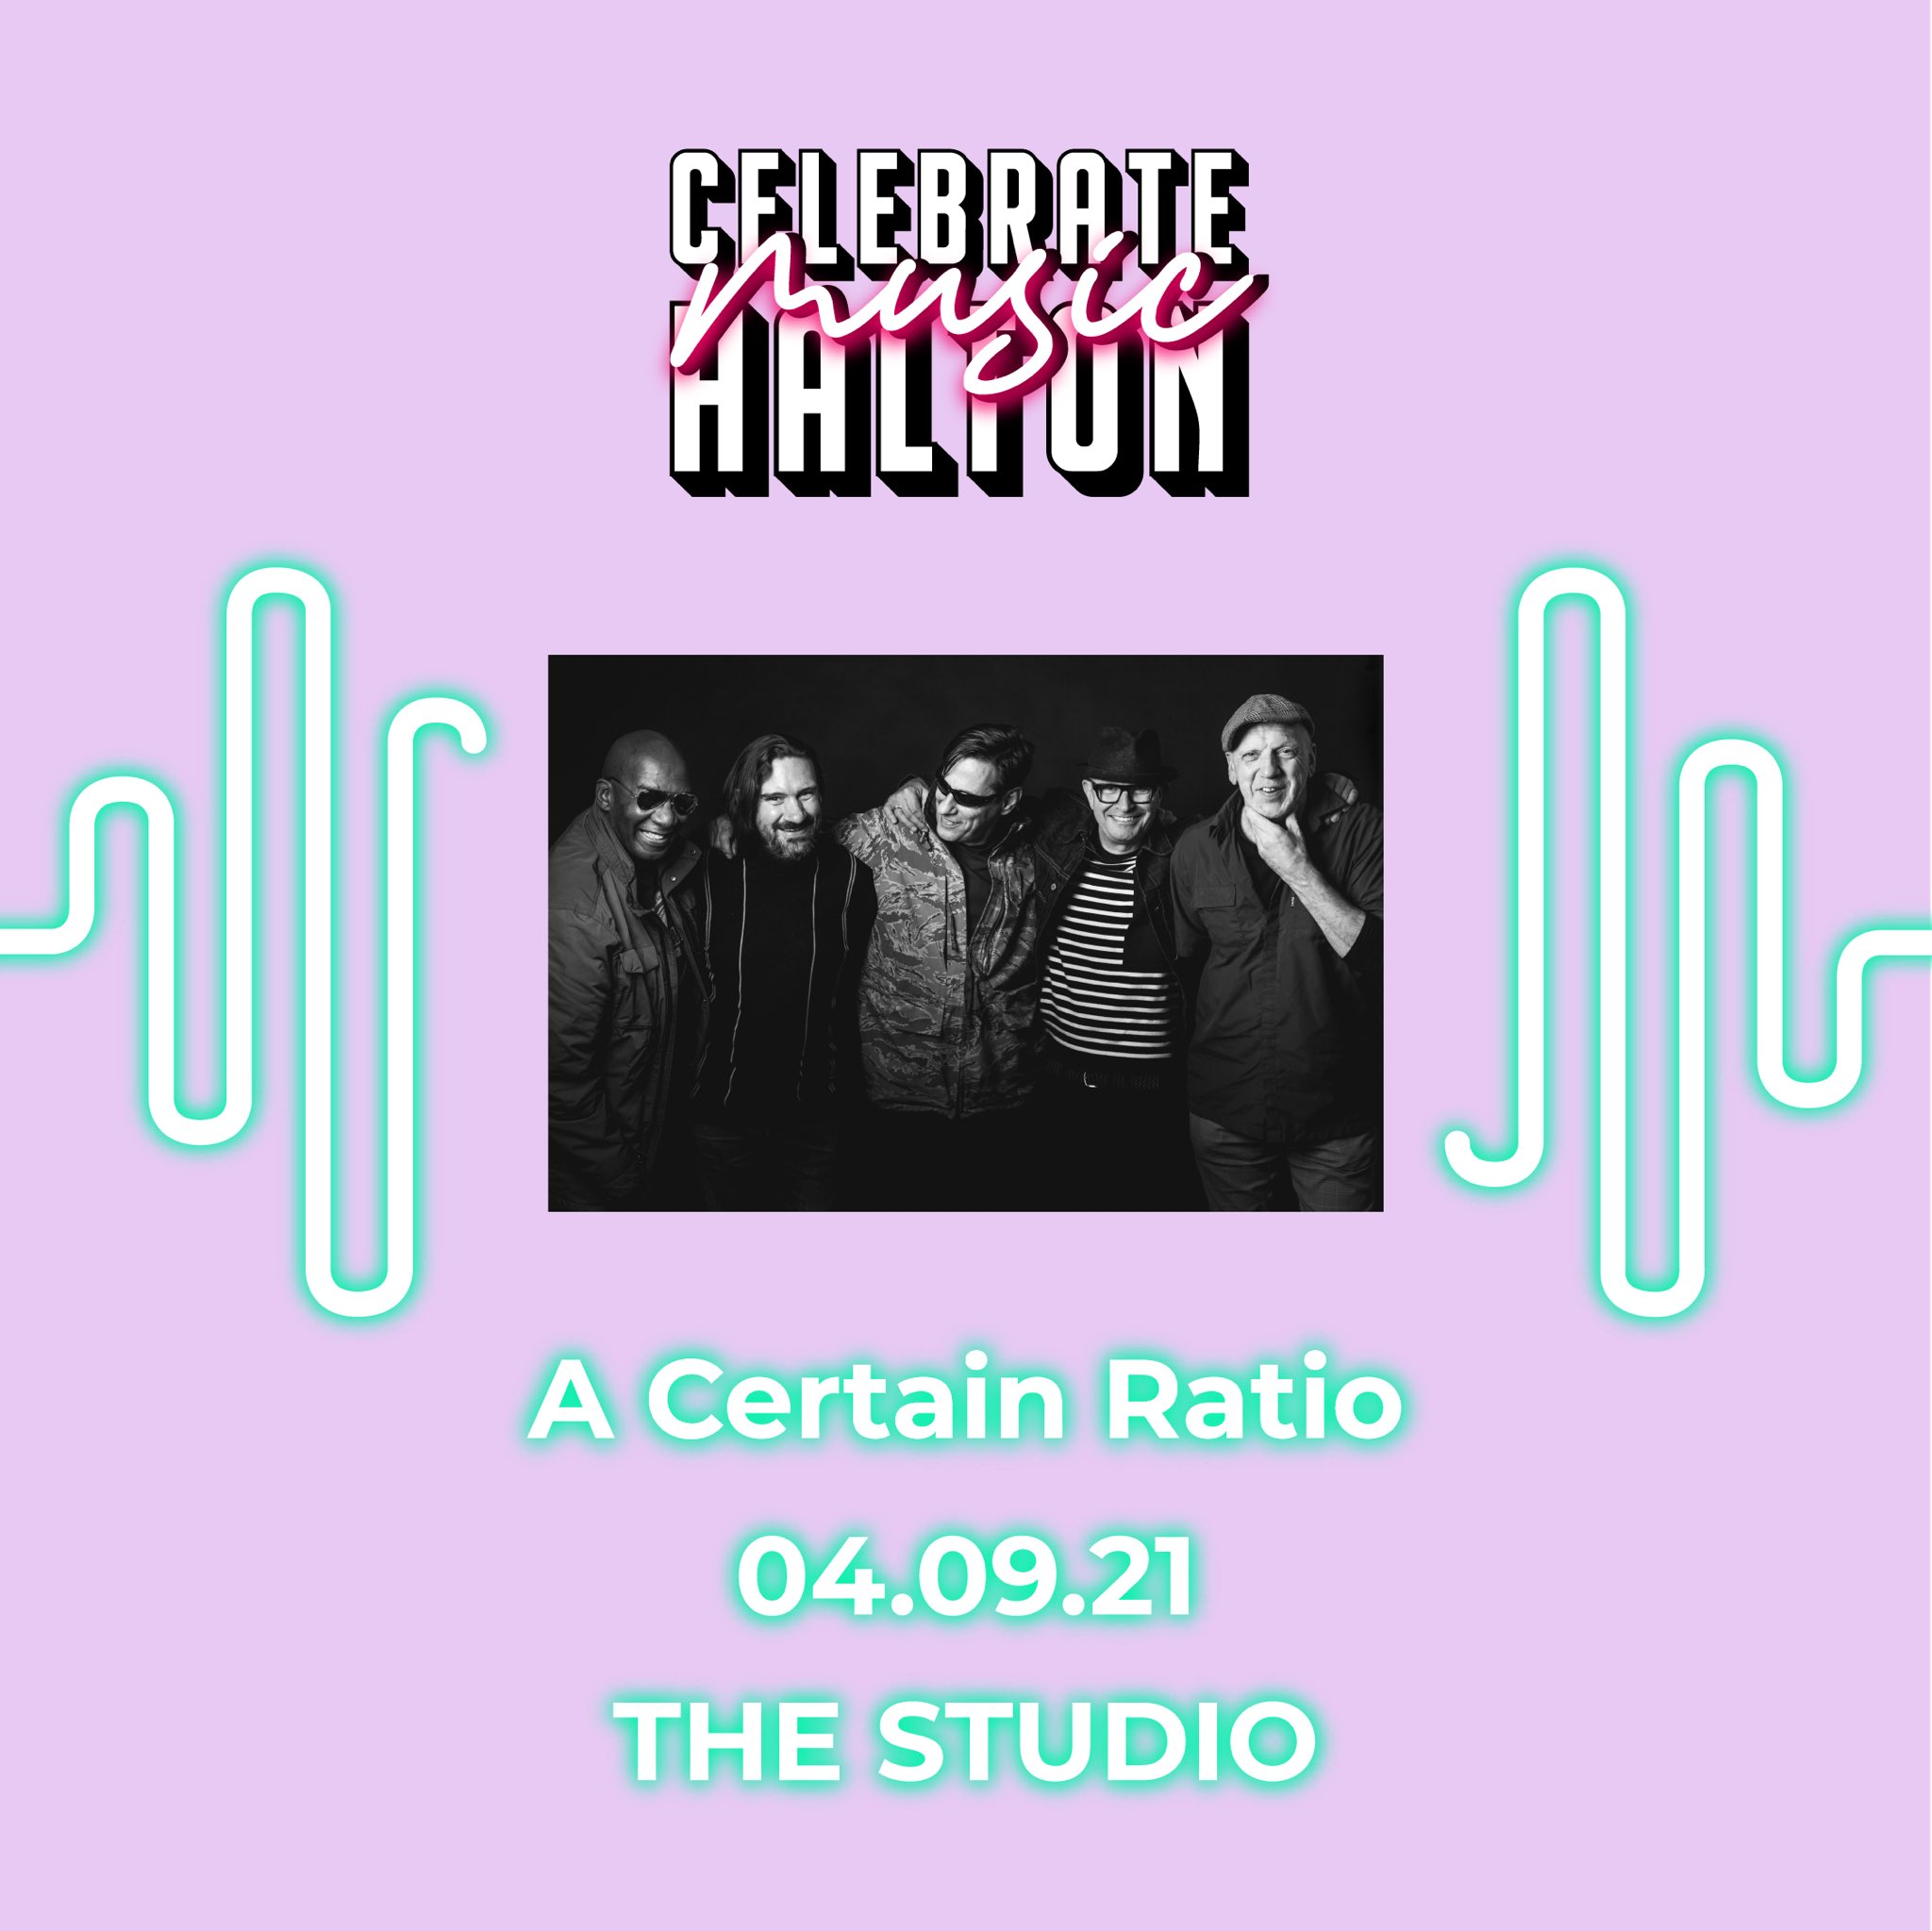 4 Sep 2021, The Studio, Halton Music Festival - ACR Gigography